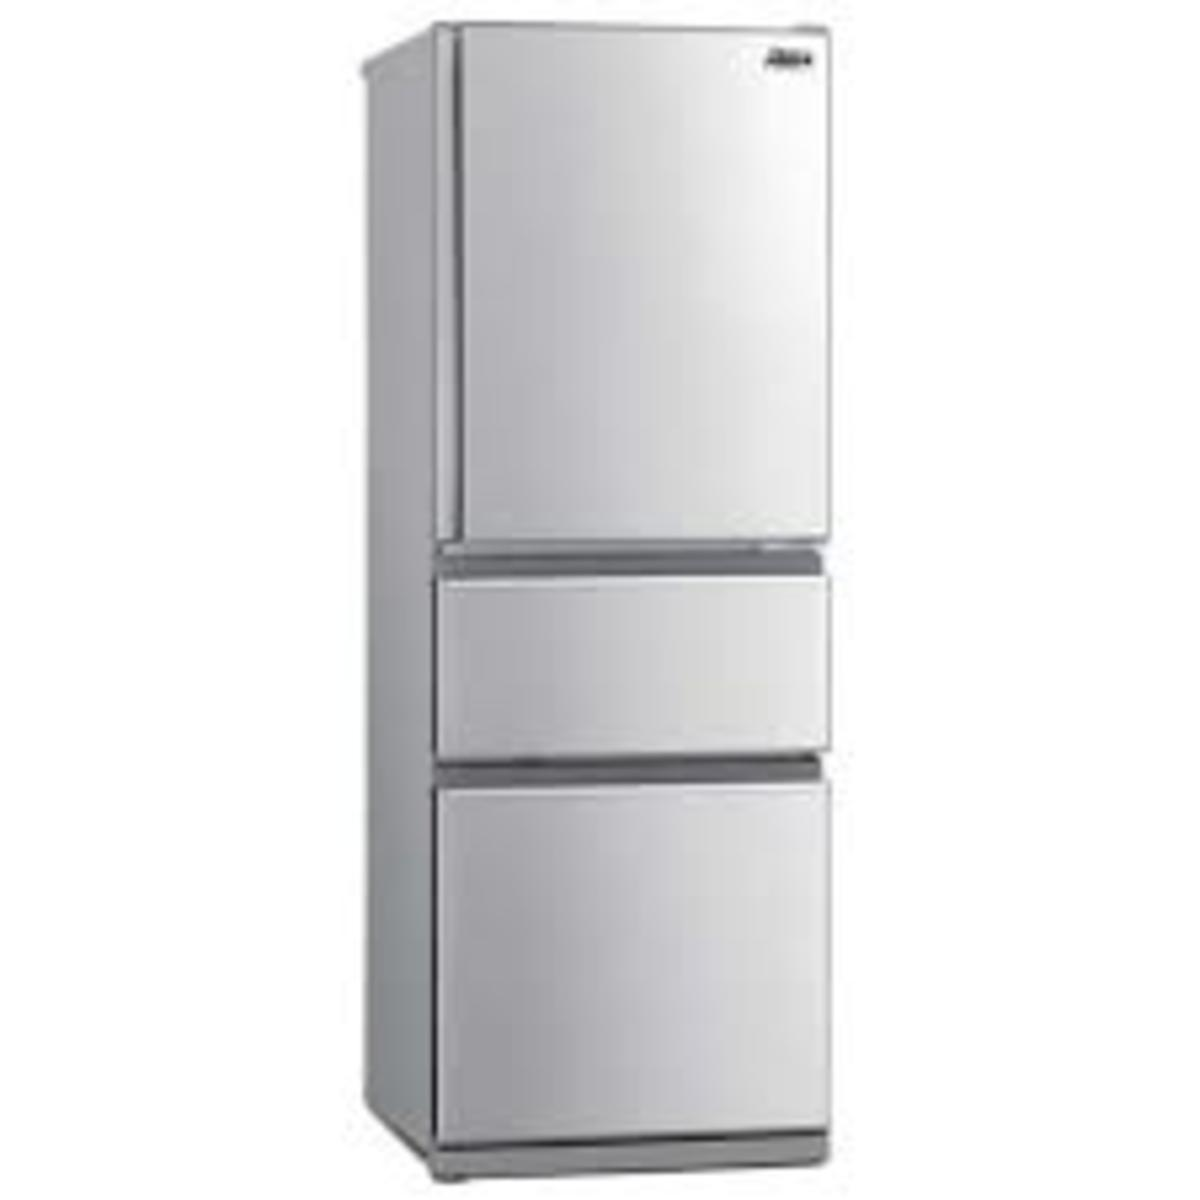 MRCX41EJ-ST 266 Liters 3-Door Inverter Refrigerator - Stainless Steel (5-year Warranty)